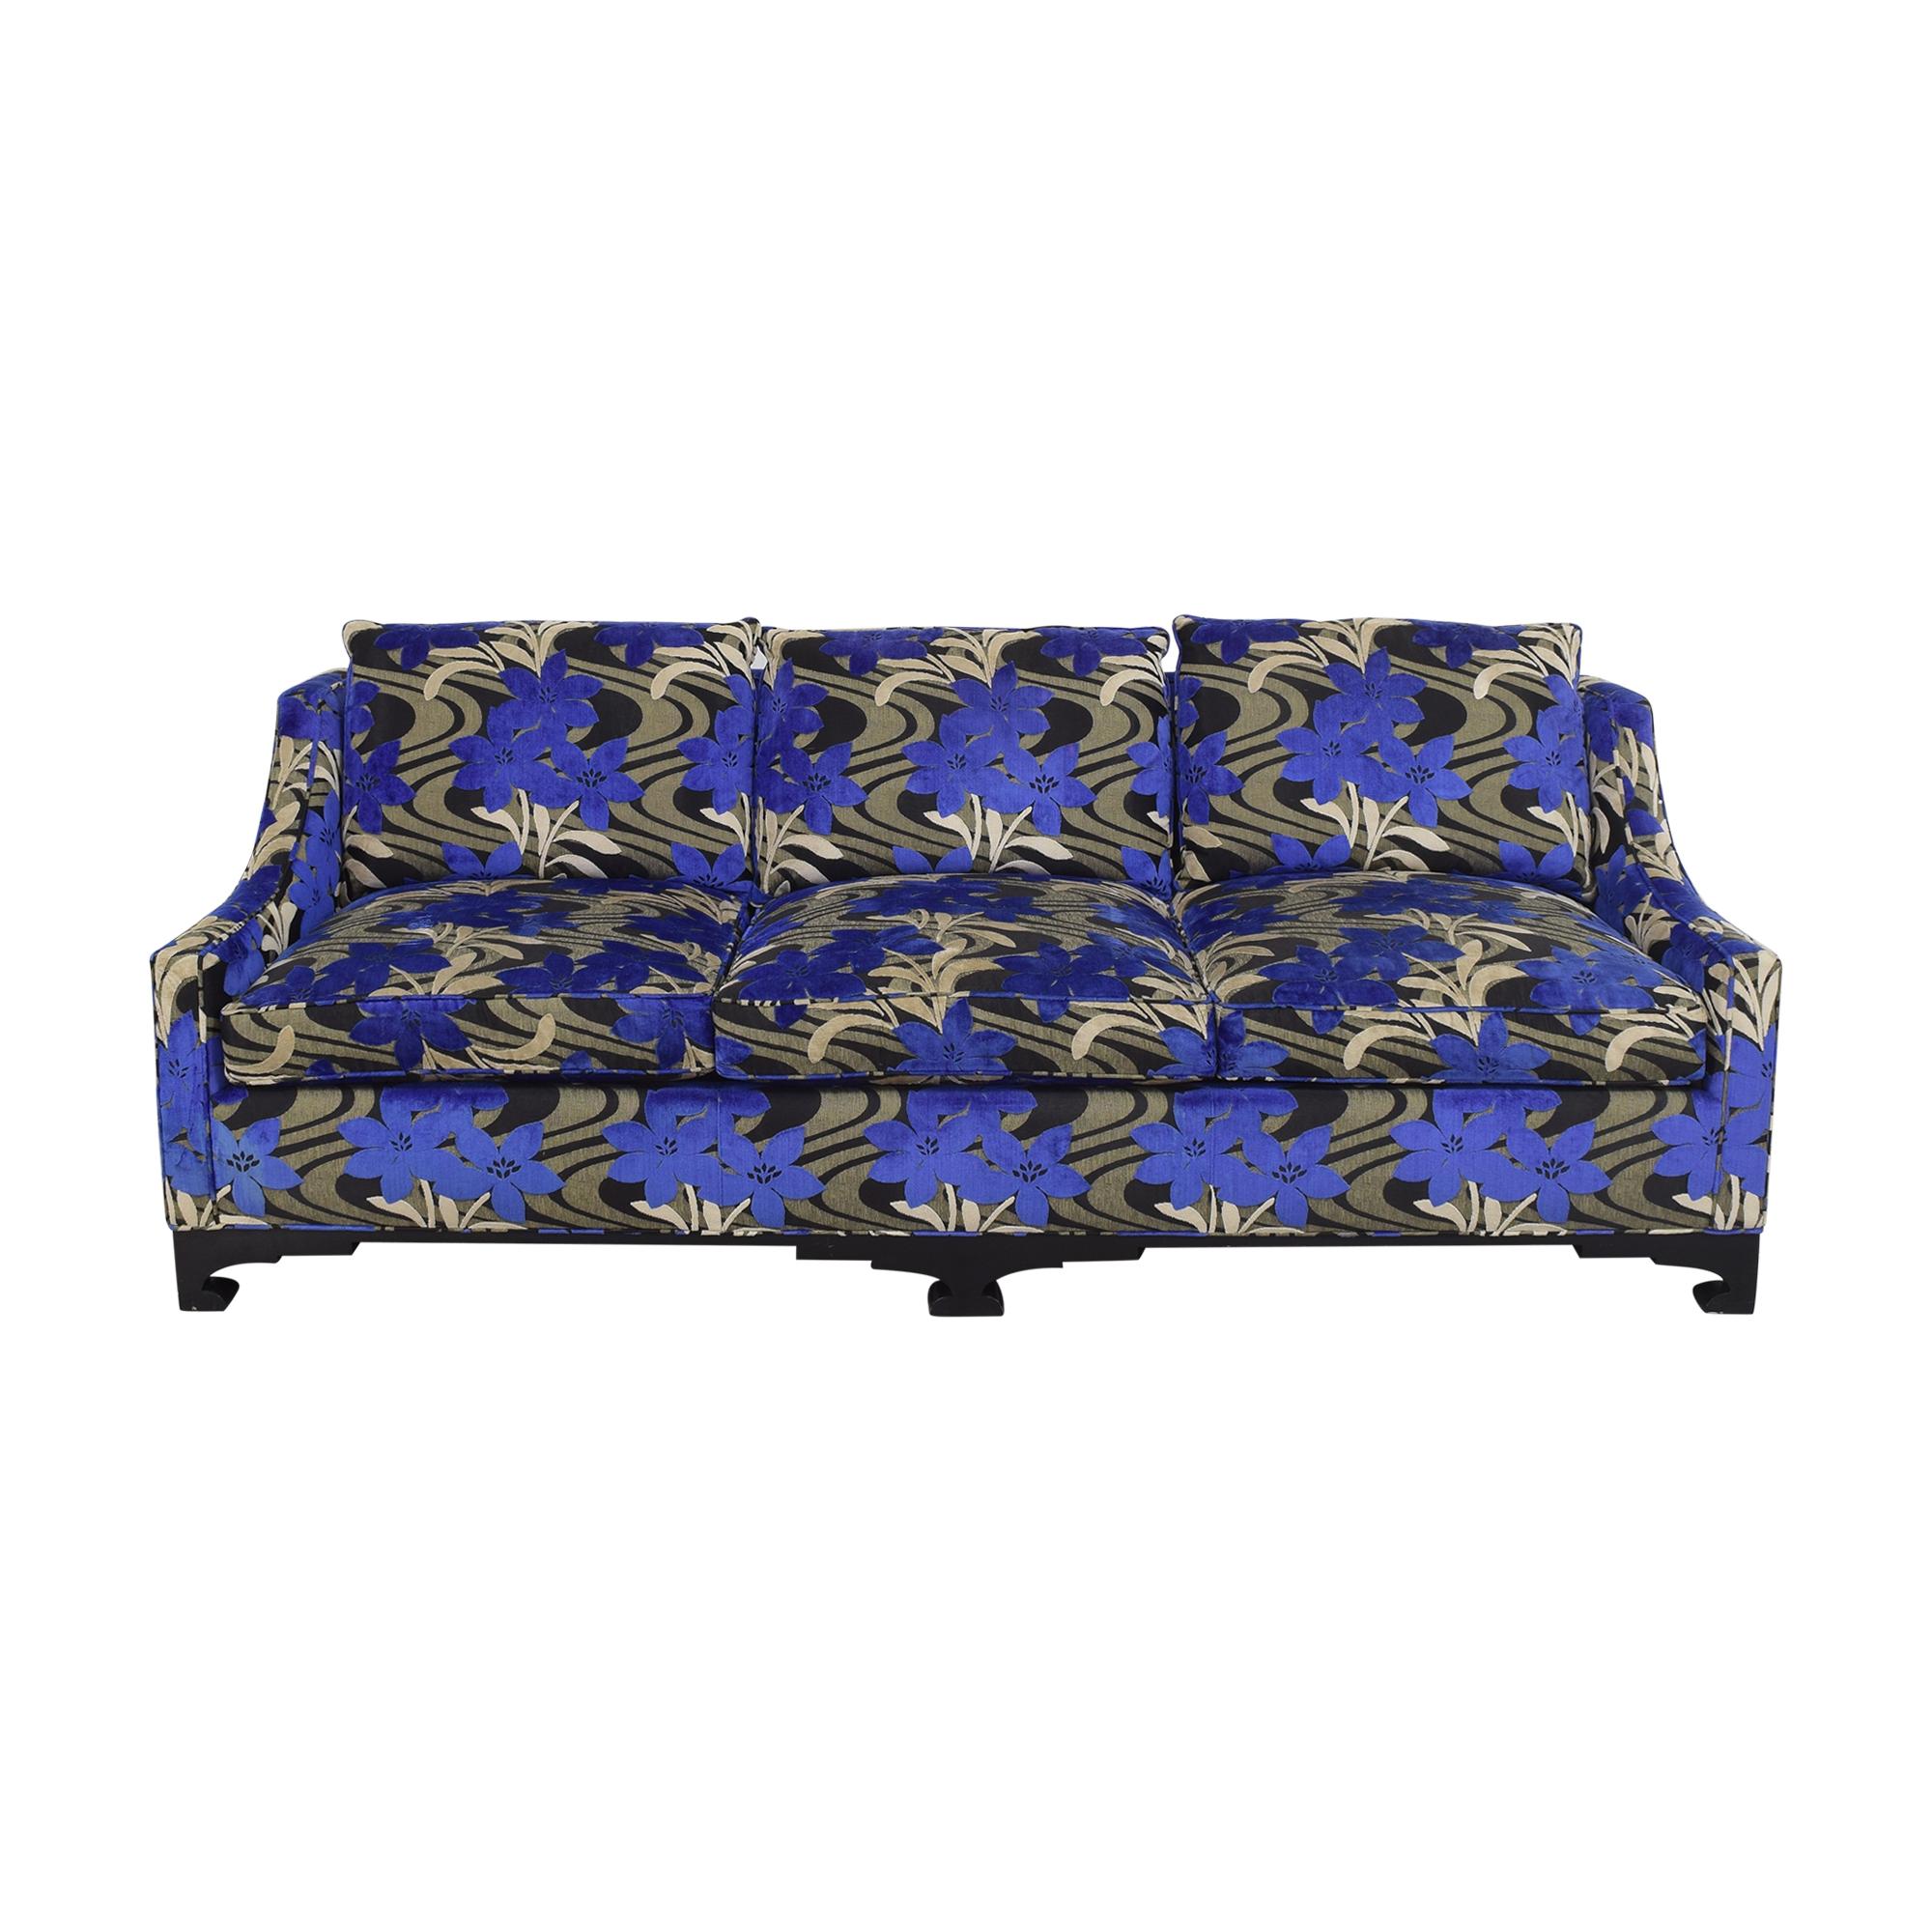 Lewis Mittman Lewis Mittman Custom Roger Thomas Bond Street Sofa on sale